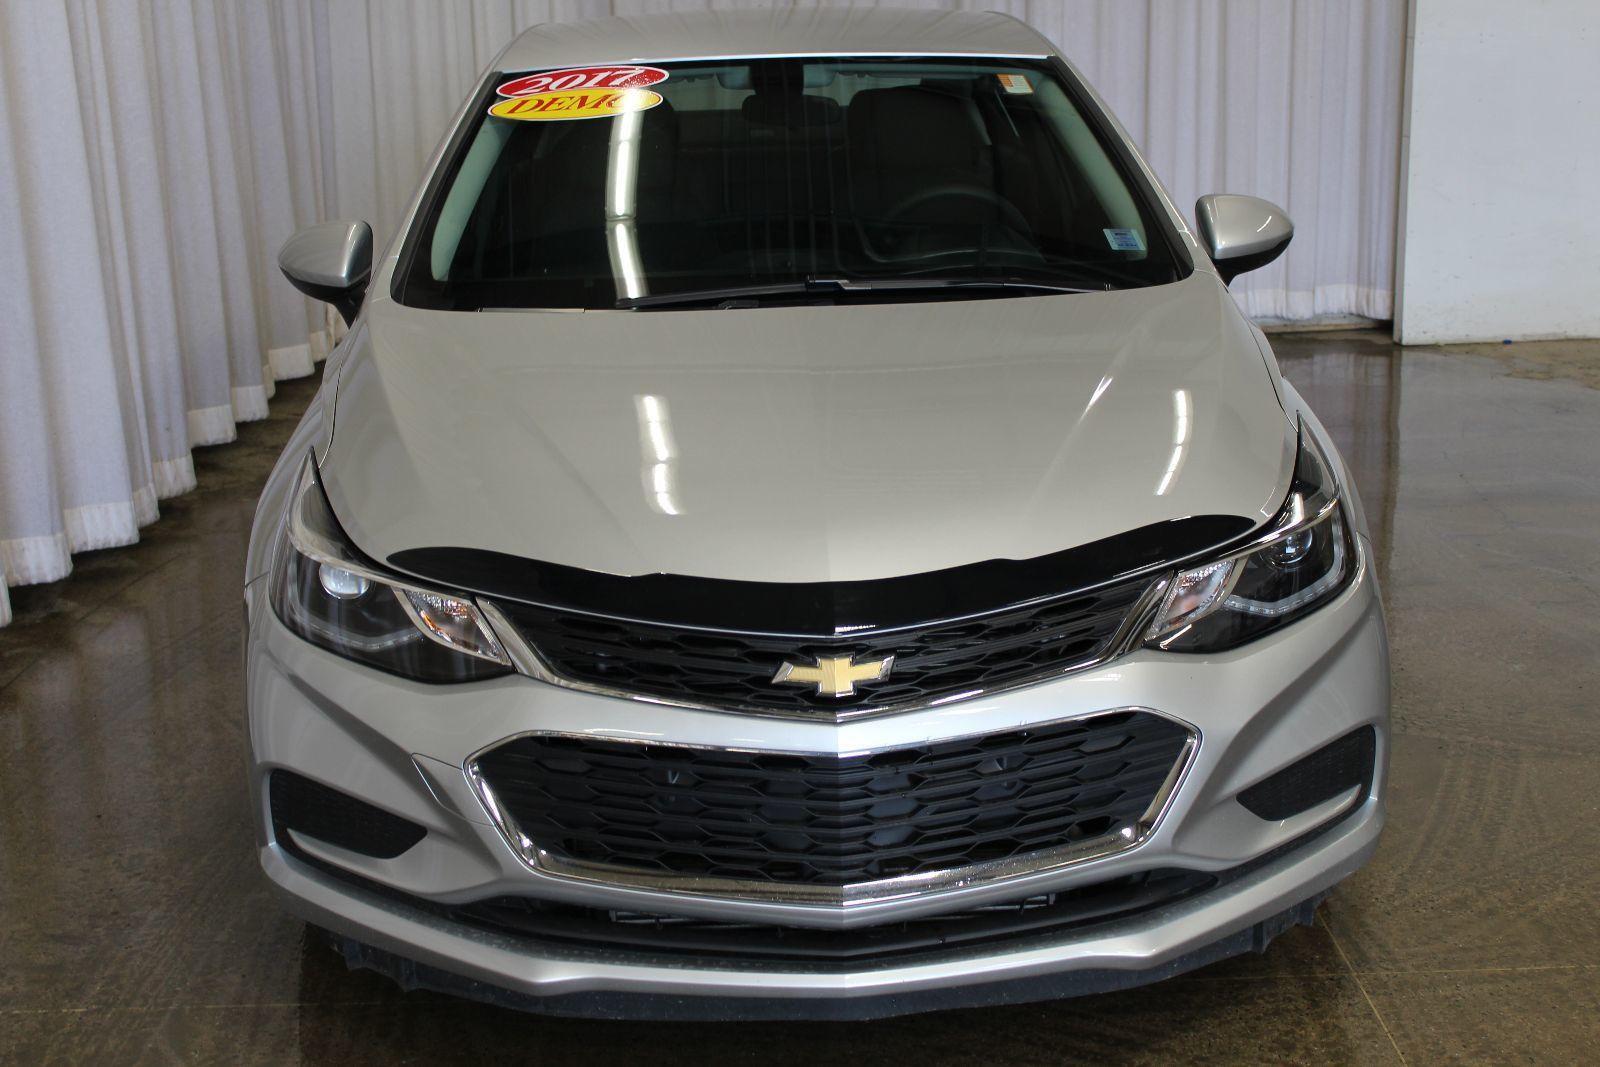 New 2017 Chevrolet Cruze LT 1.4L 4 CYL TURBOCHARGED ...